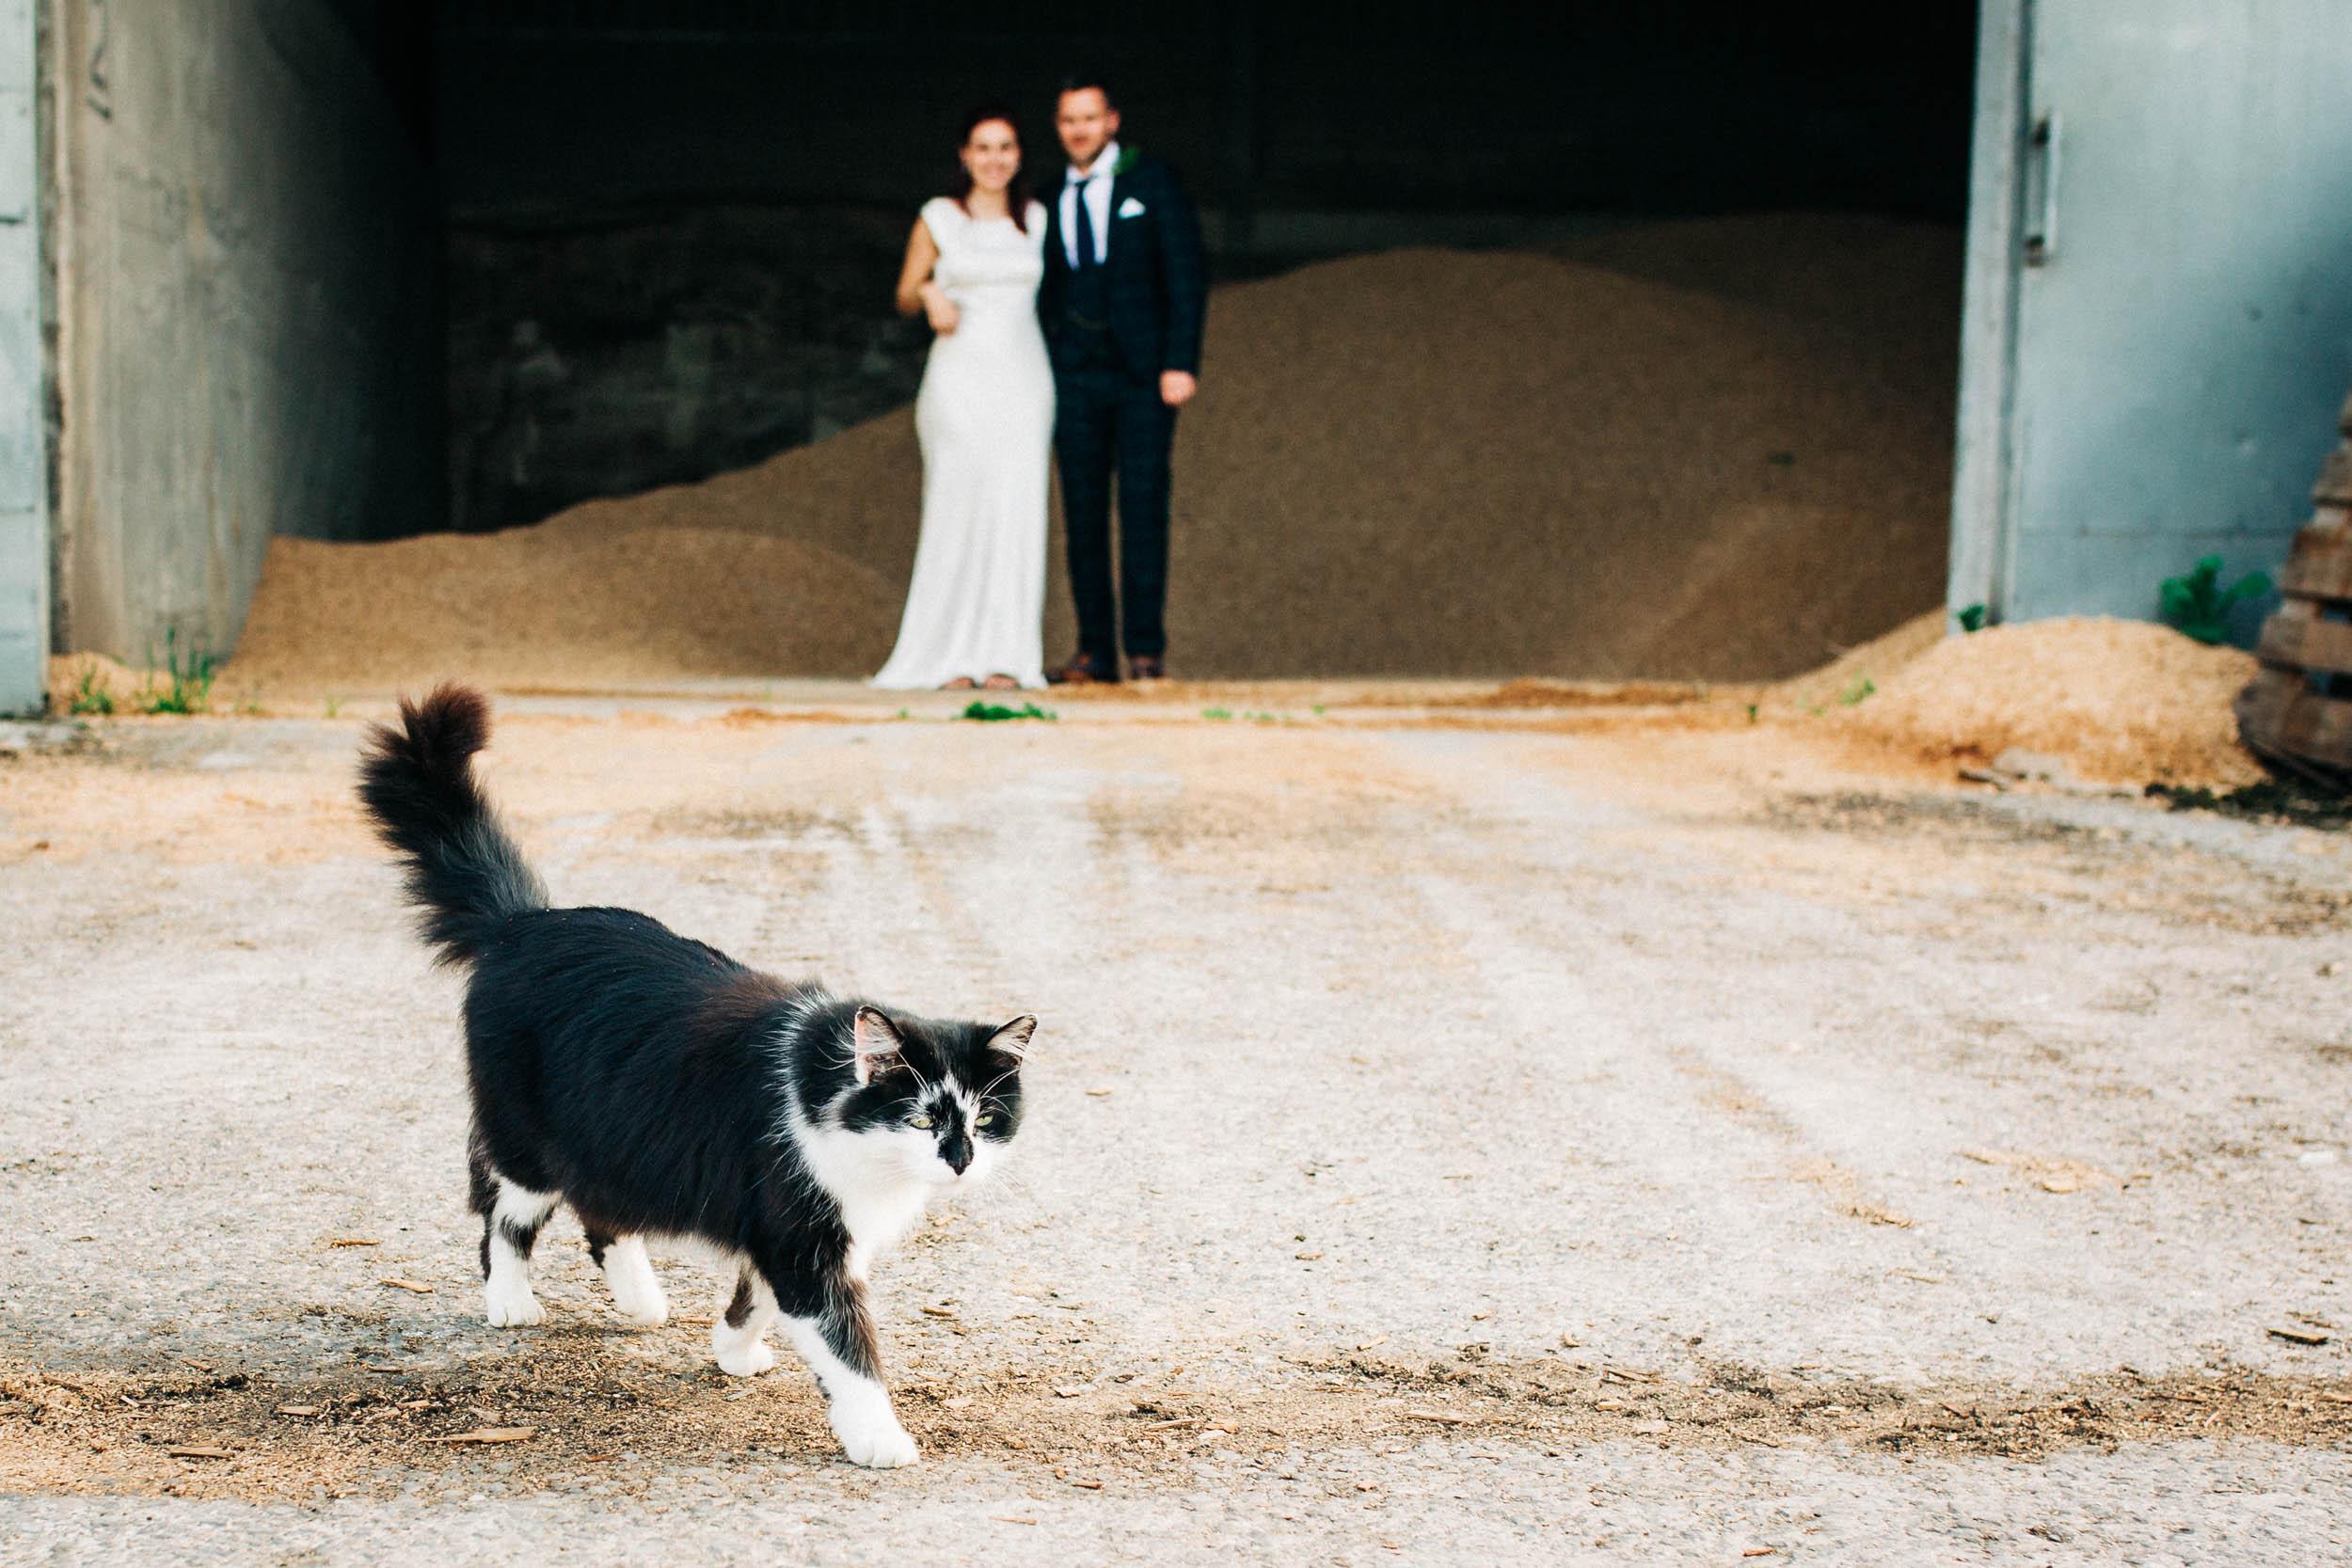 Alex_Sedgmond_Photography-SouthWalesWeddingPhotography-Wedding-Photographer-Cardiff-151.jpg